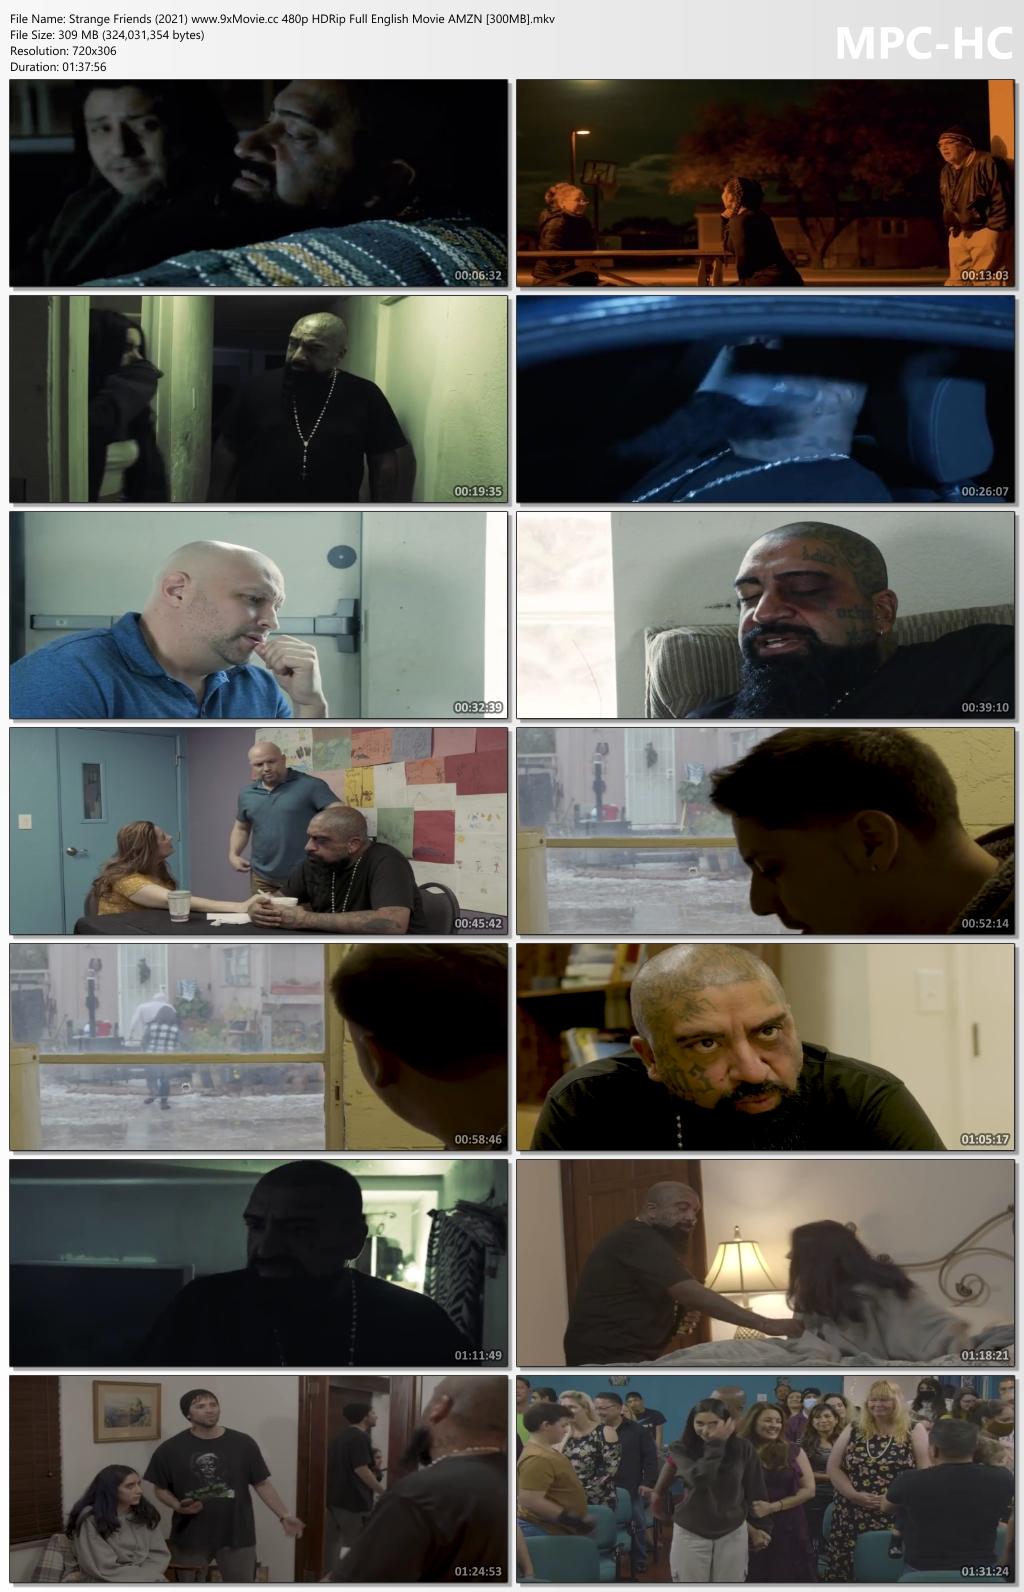 Strange-Friends-2021-www-9x-Movie-cc-480p-HDRip-Full-English-Movie-AMZN-300-MB-mkv